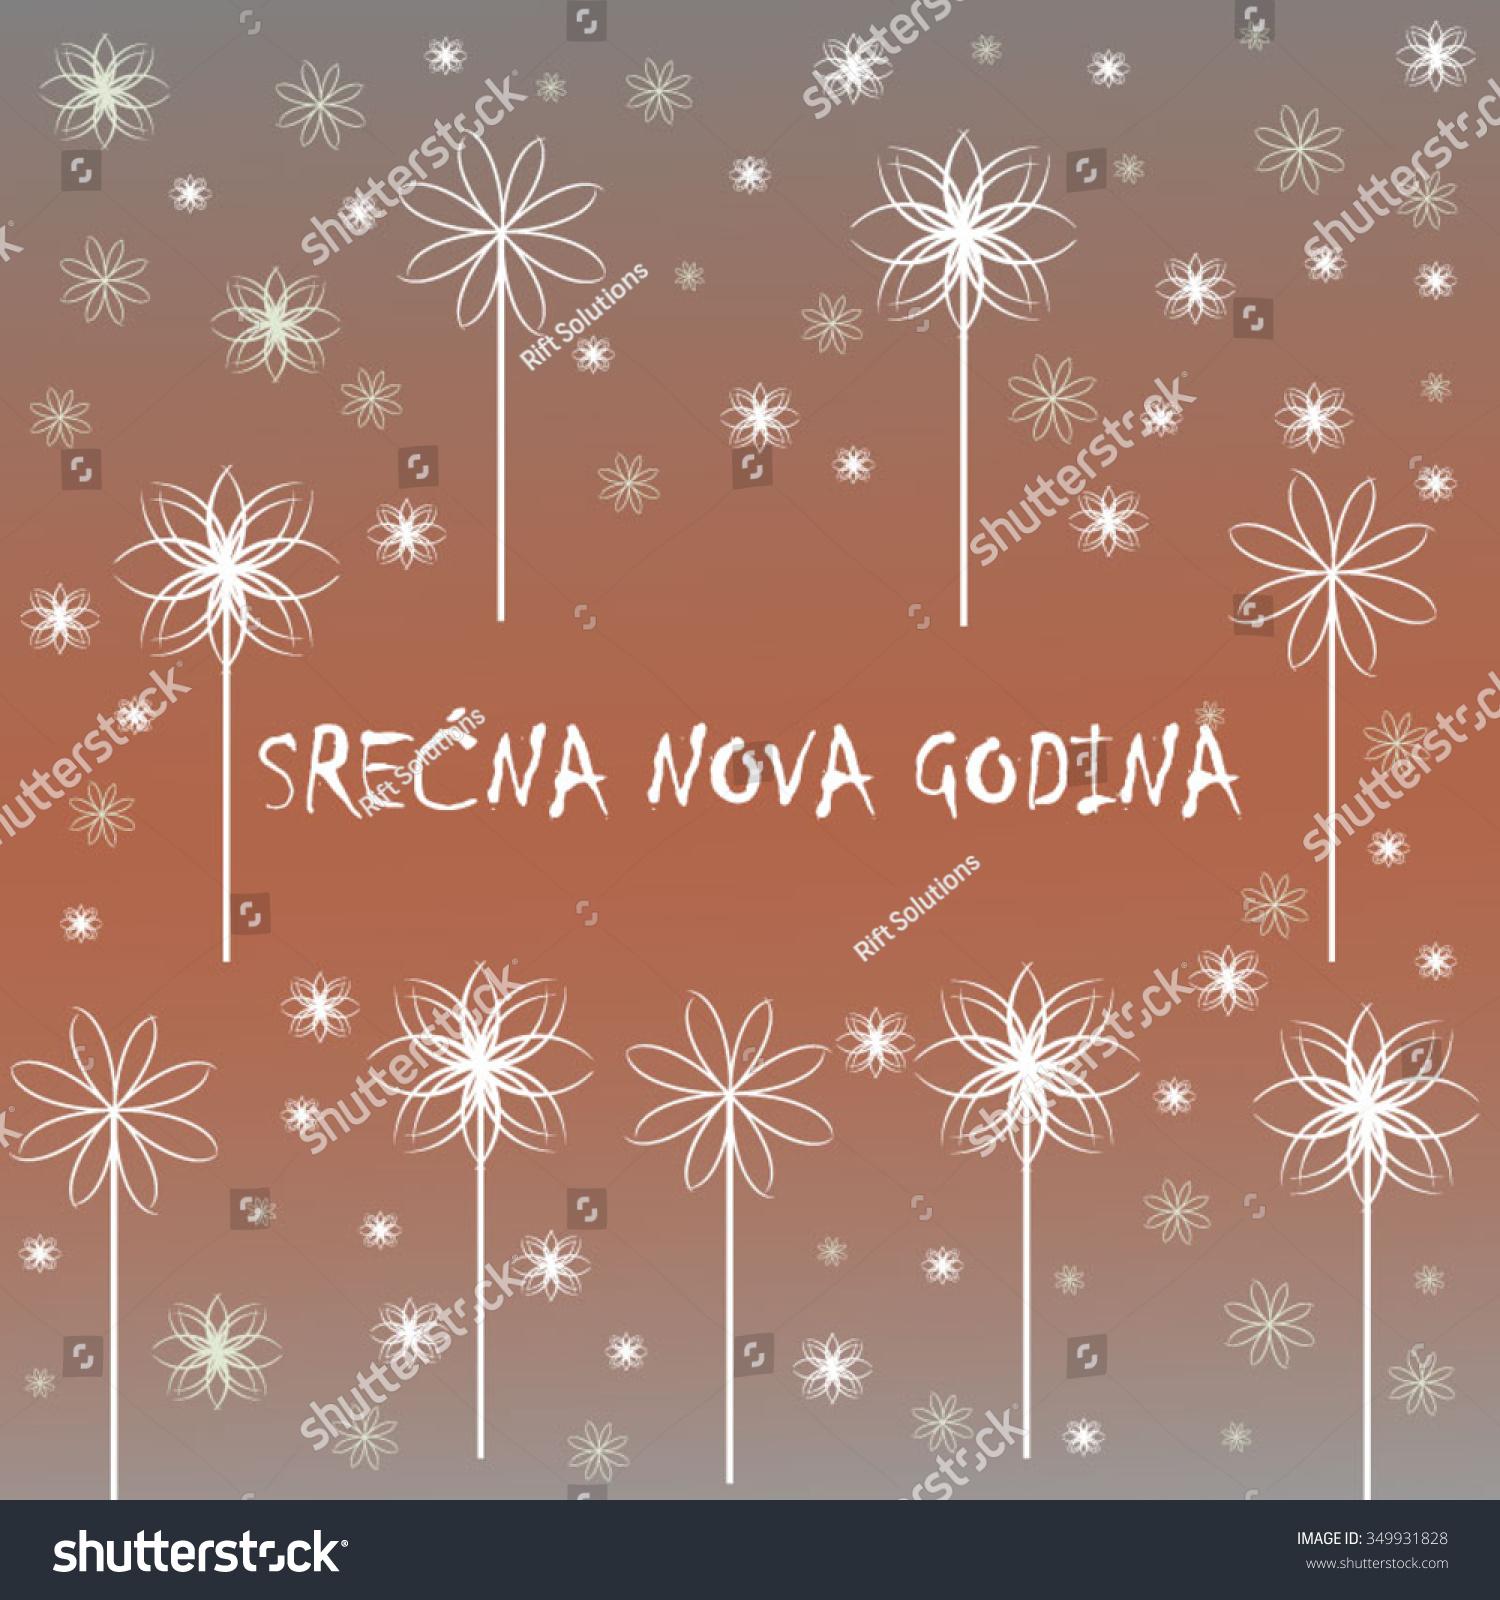 New year greeting cards serbian montenegrin stock vector 349931828 new year greeting cards to serbian montenegrin bosnian and croatian language kristyandbryce Images